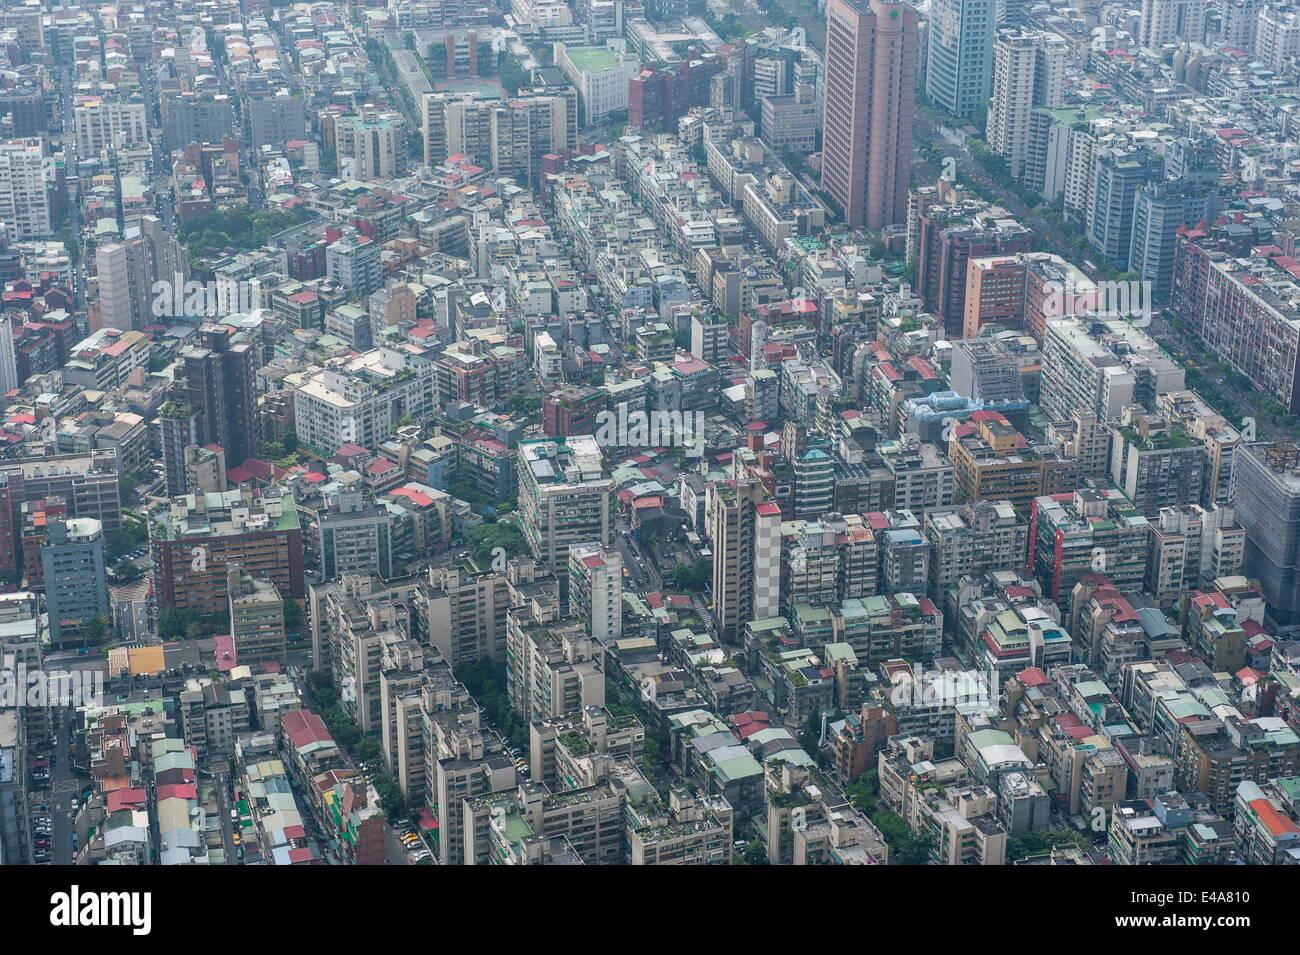 View over Taipei from the 101 Tower, Taipei, Taiwan, Asia - Stock Image